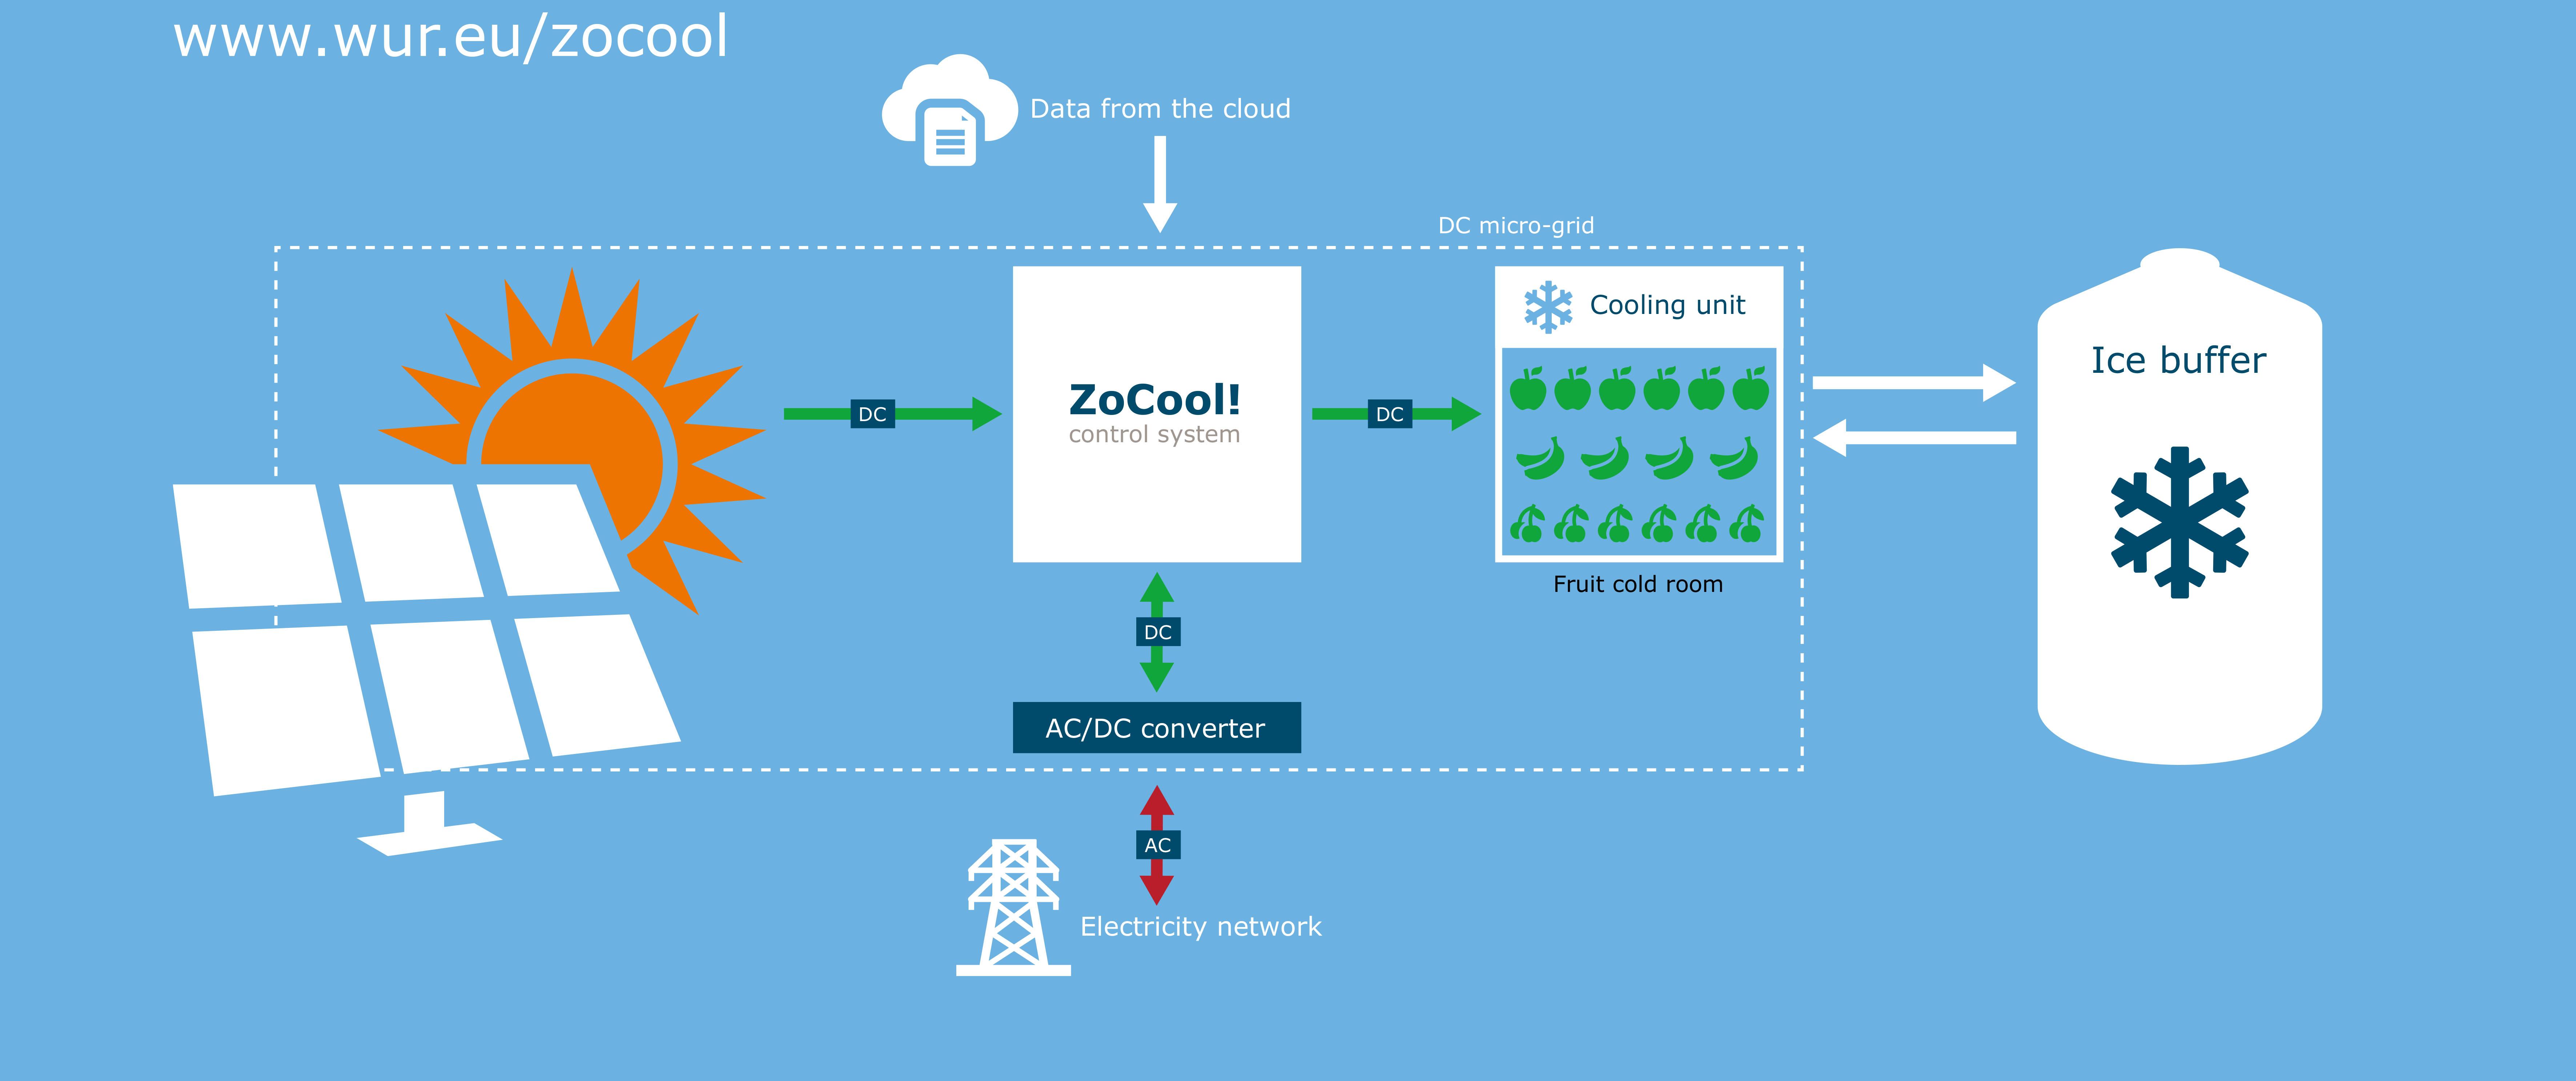 ZoCool! Smart cooling using solar energy - WUR